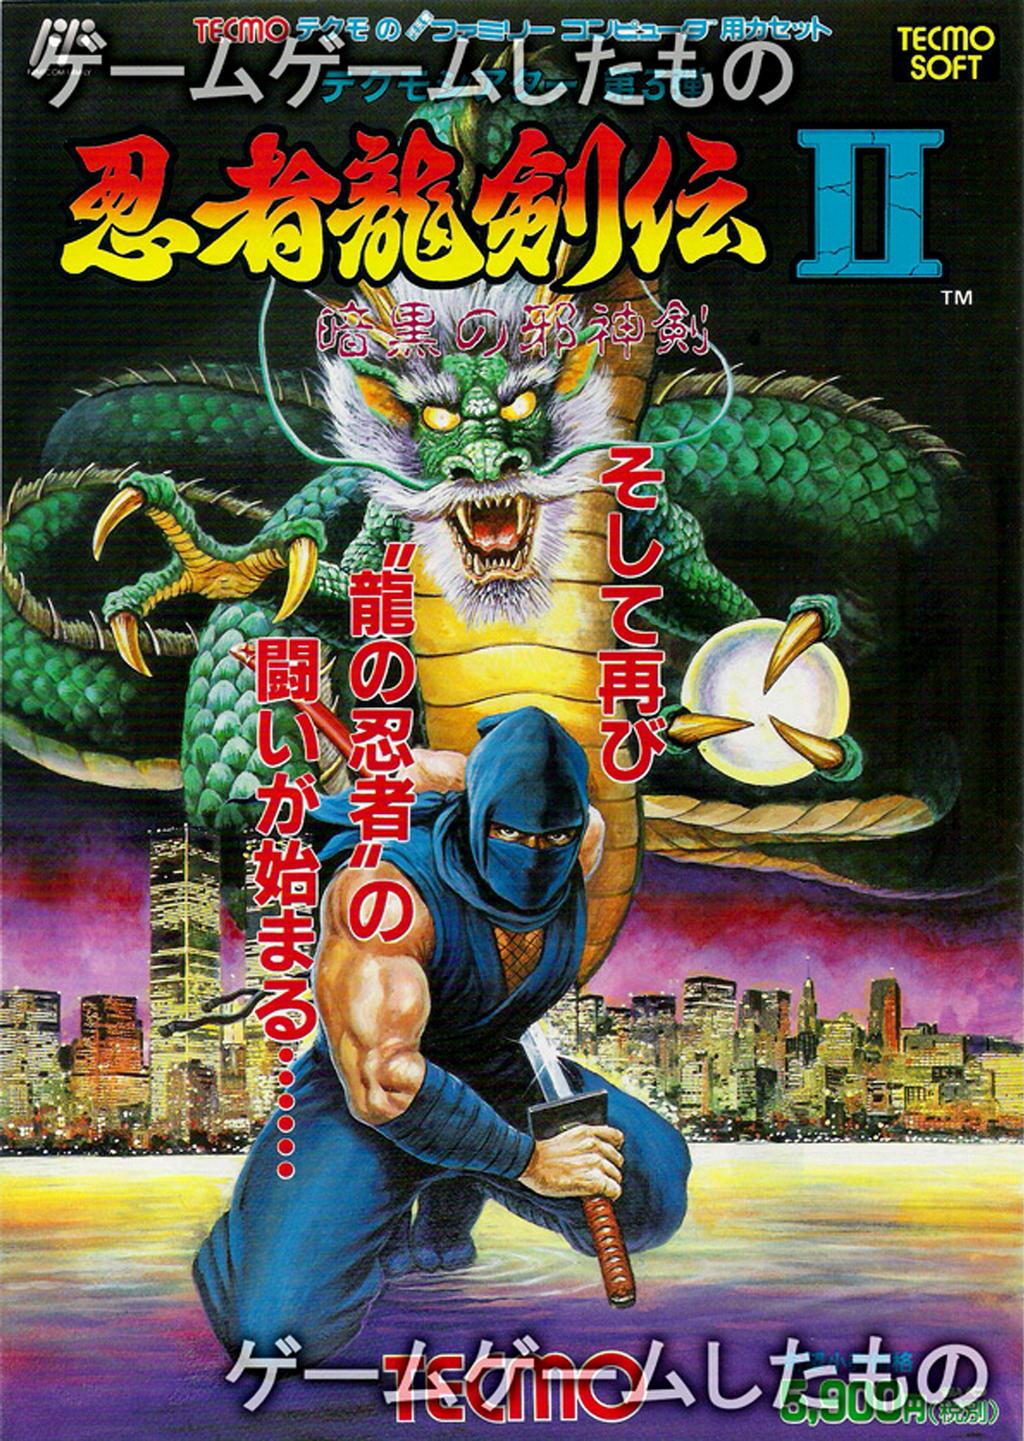 Ninja Gaiden 2 Japan Cover By Myroboto On Deviantart